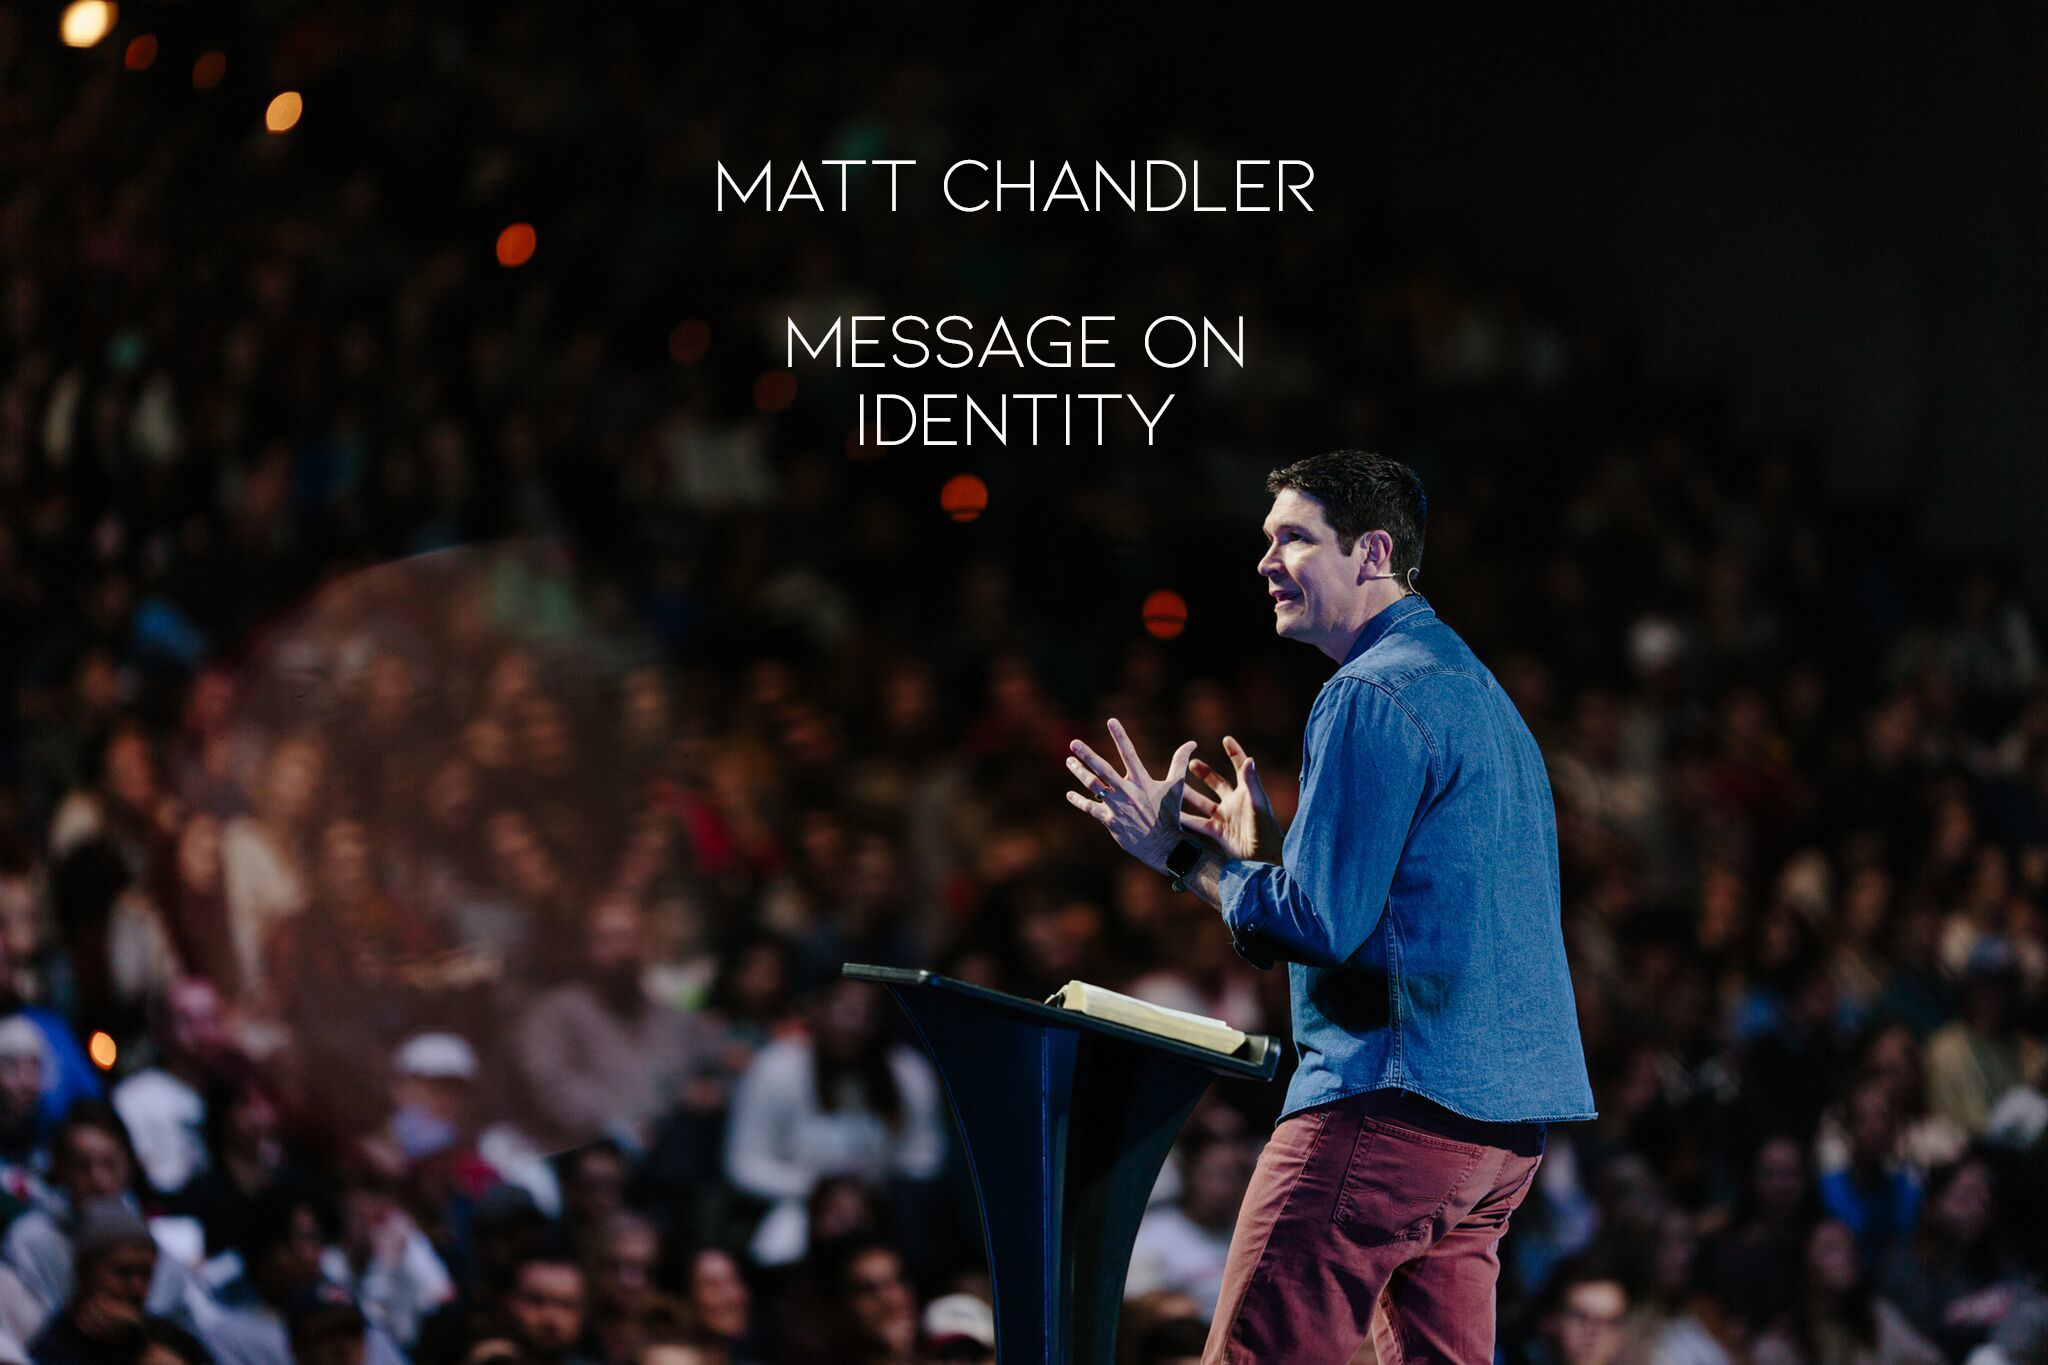 Message on Identity